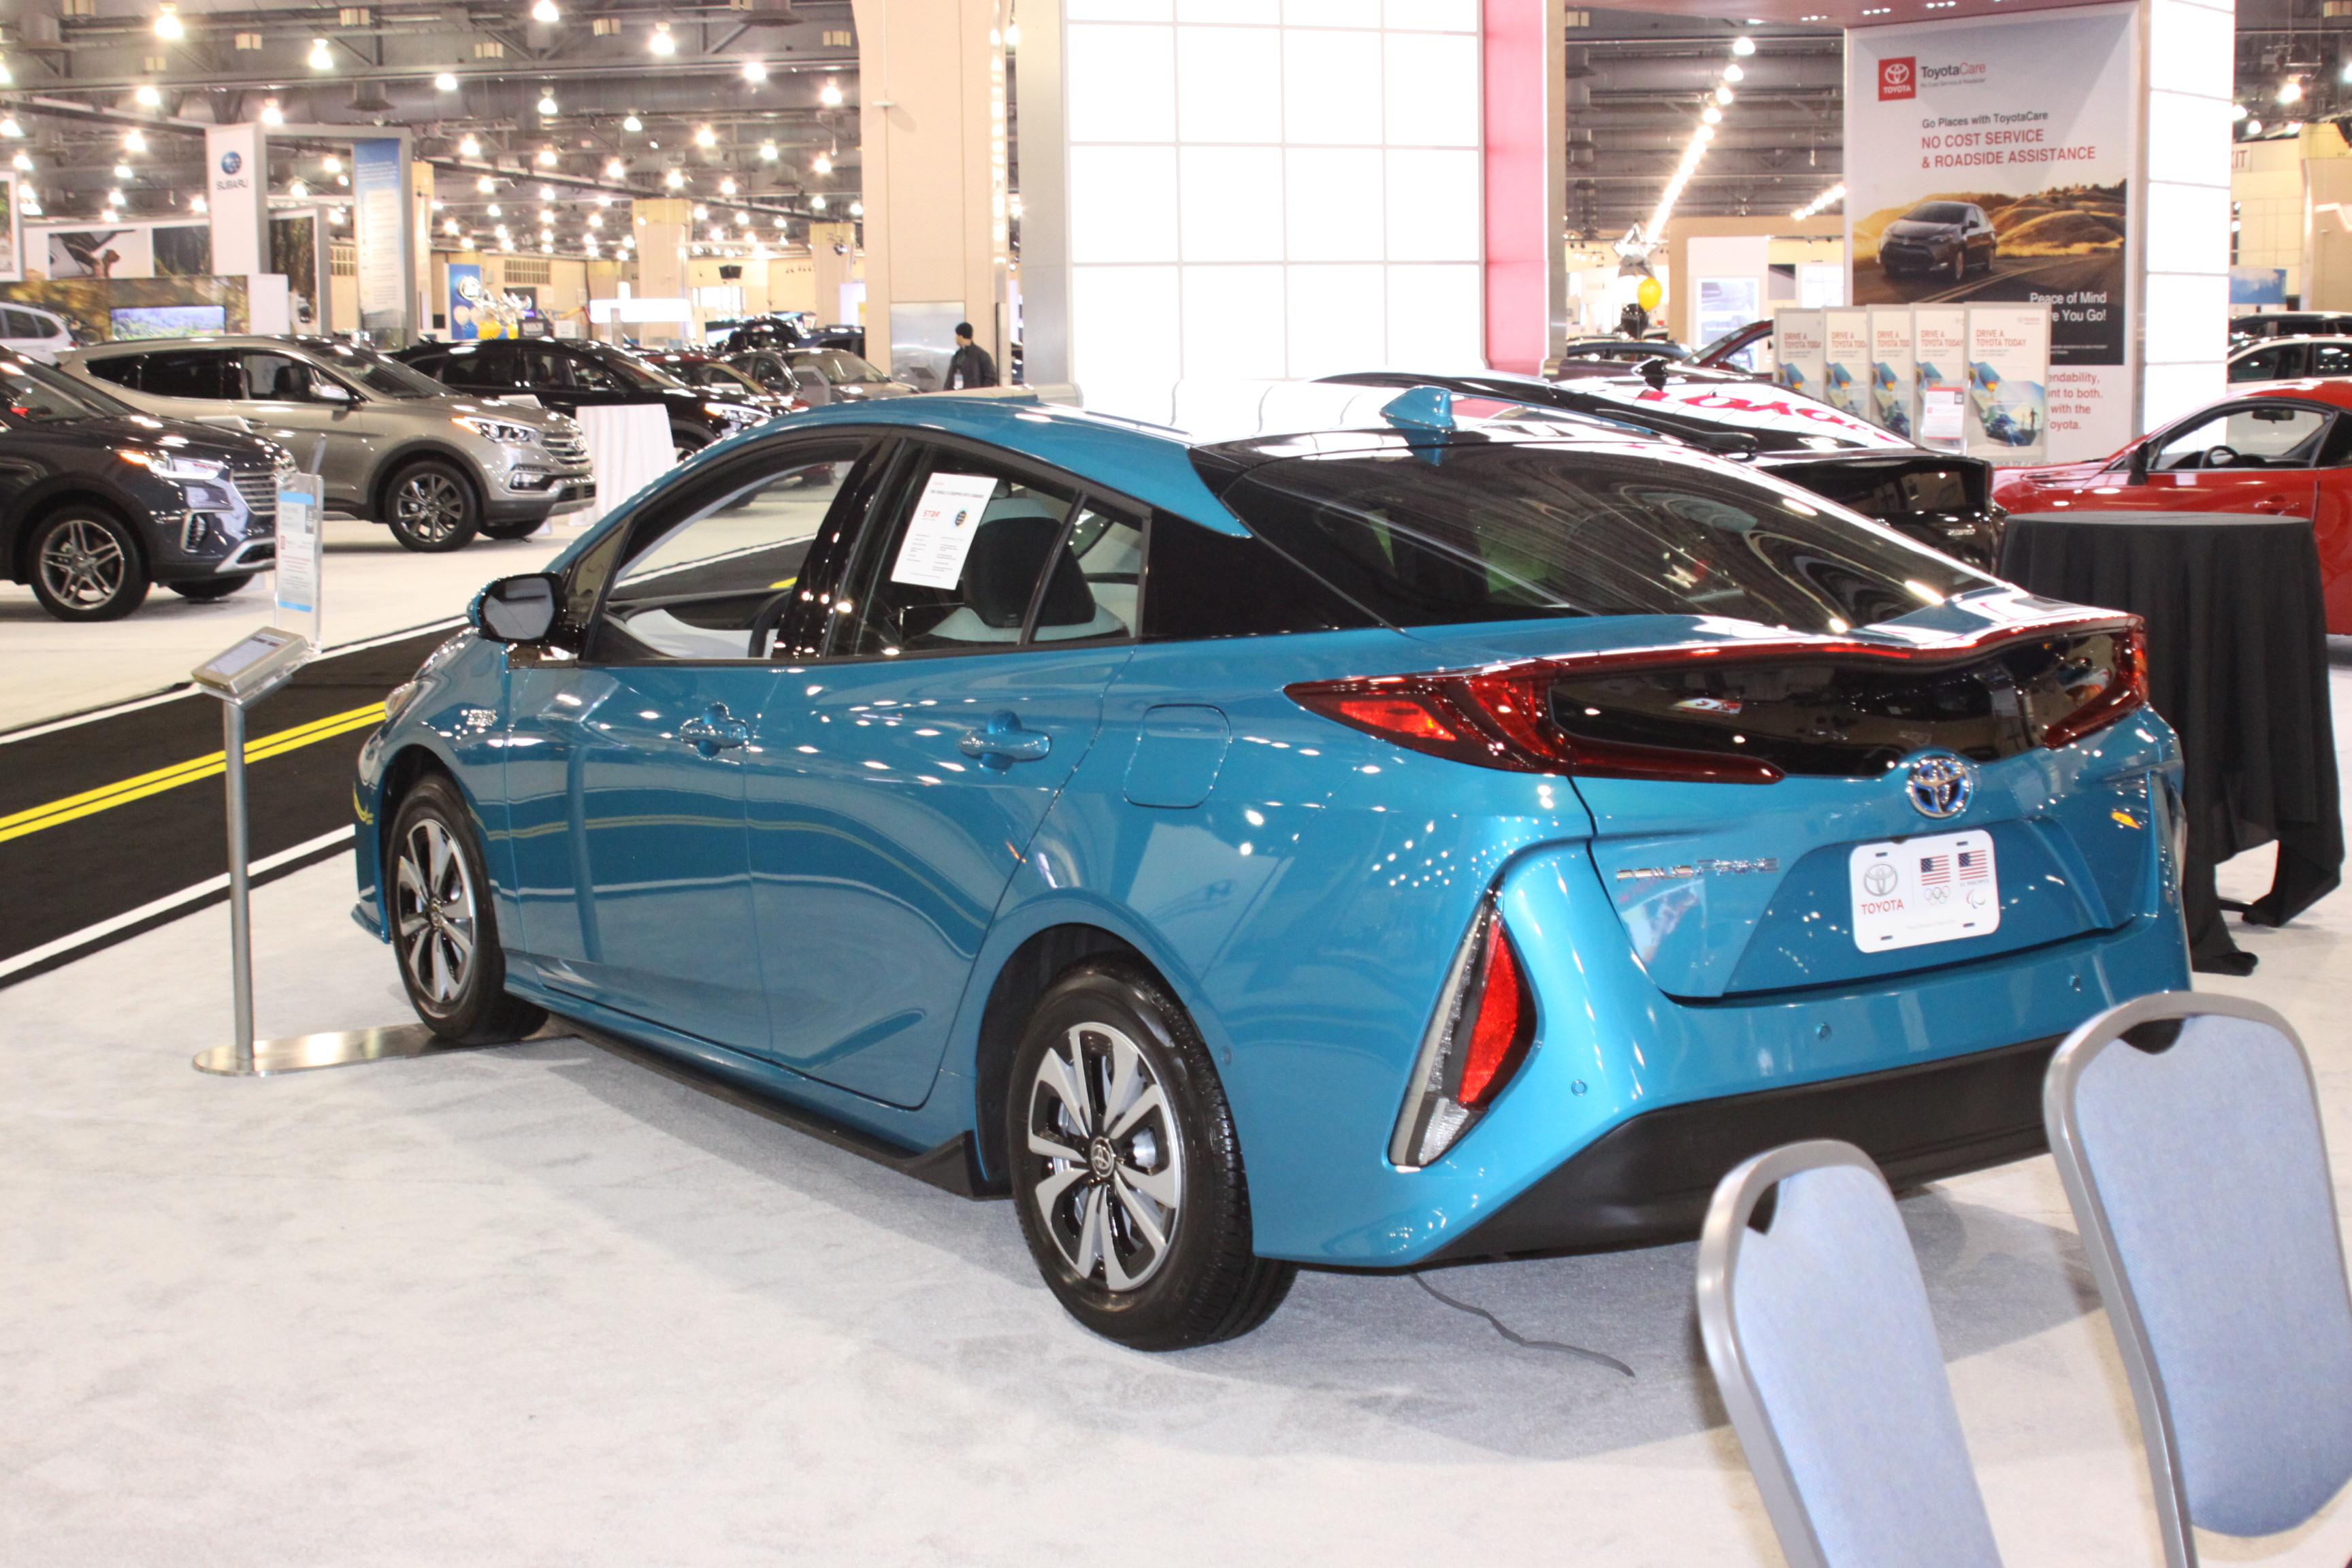 GALLERY Philadelphia Auto Show WTWC - Philadelphia convention center car show